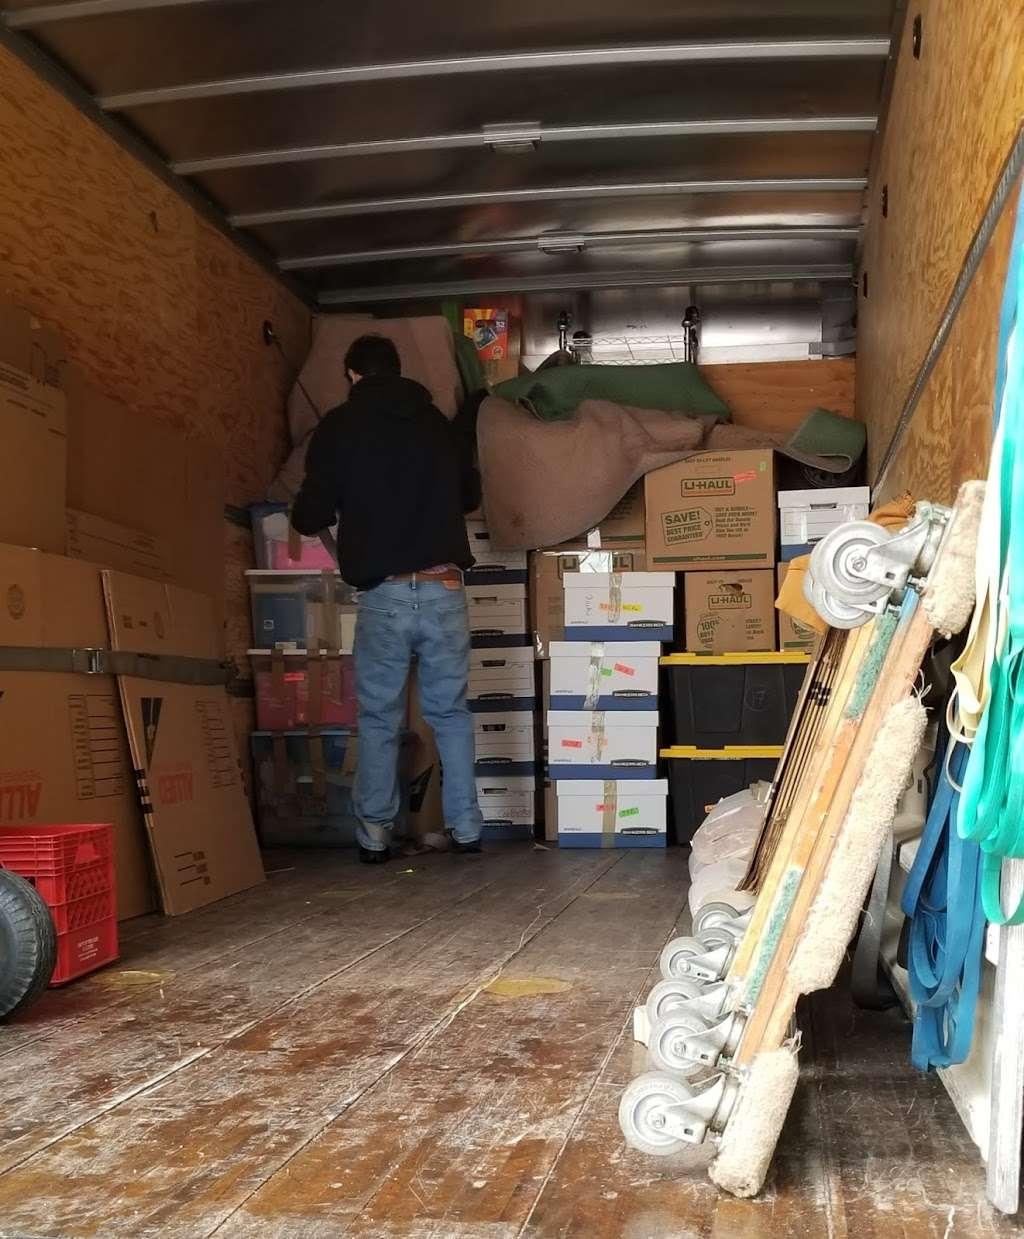 Santa Rosa Moving & Storage - storage  | Photo 6 of 8 | Address: 5650 State Farm Dr, Rohnert Park, CA 94928, USA | Phone: (707) 584-8585